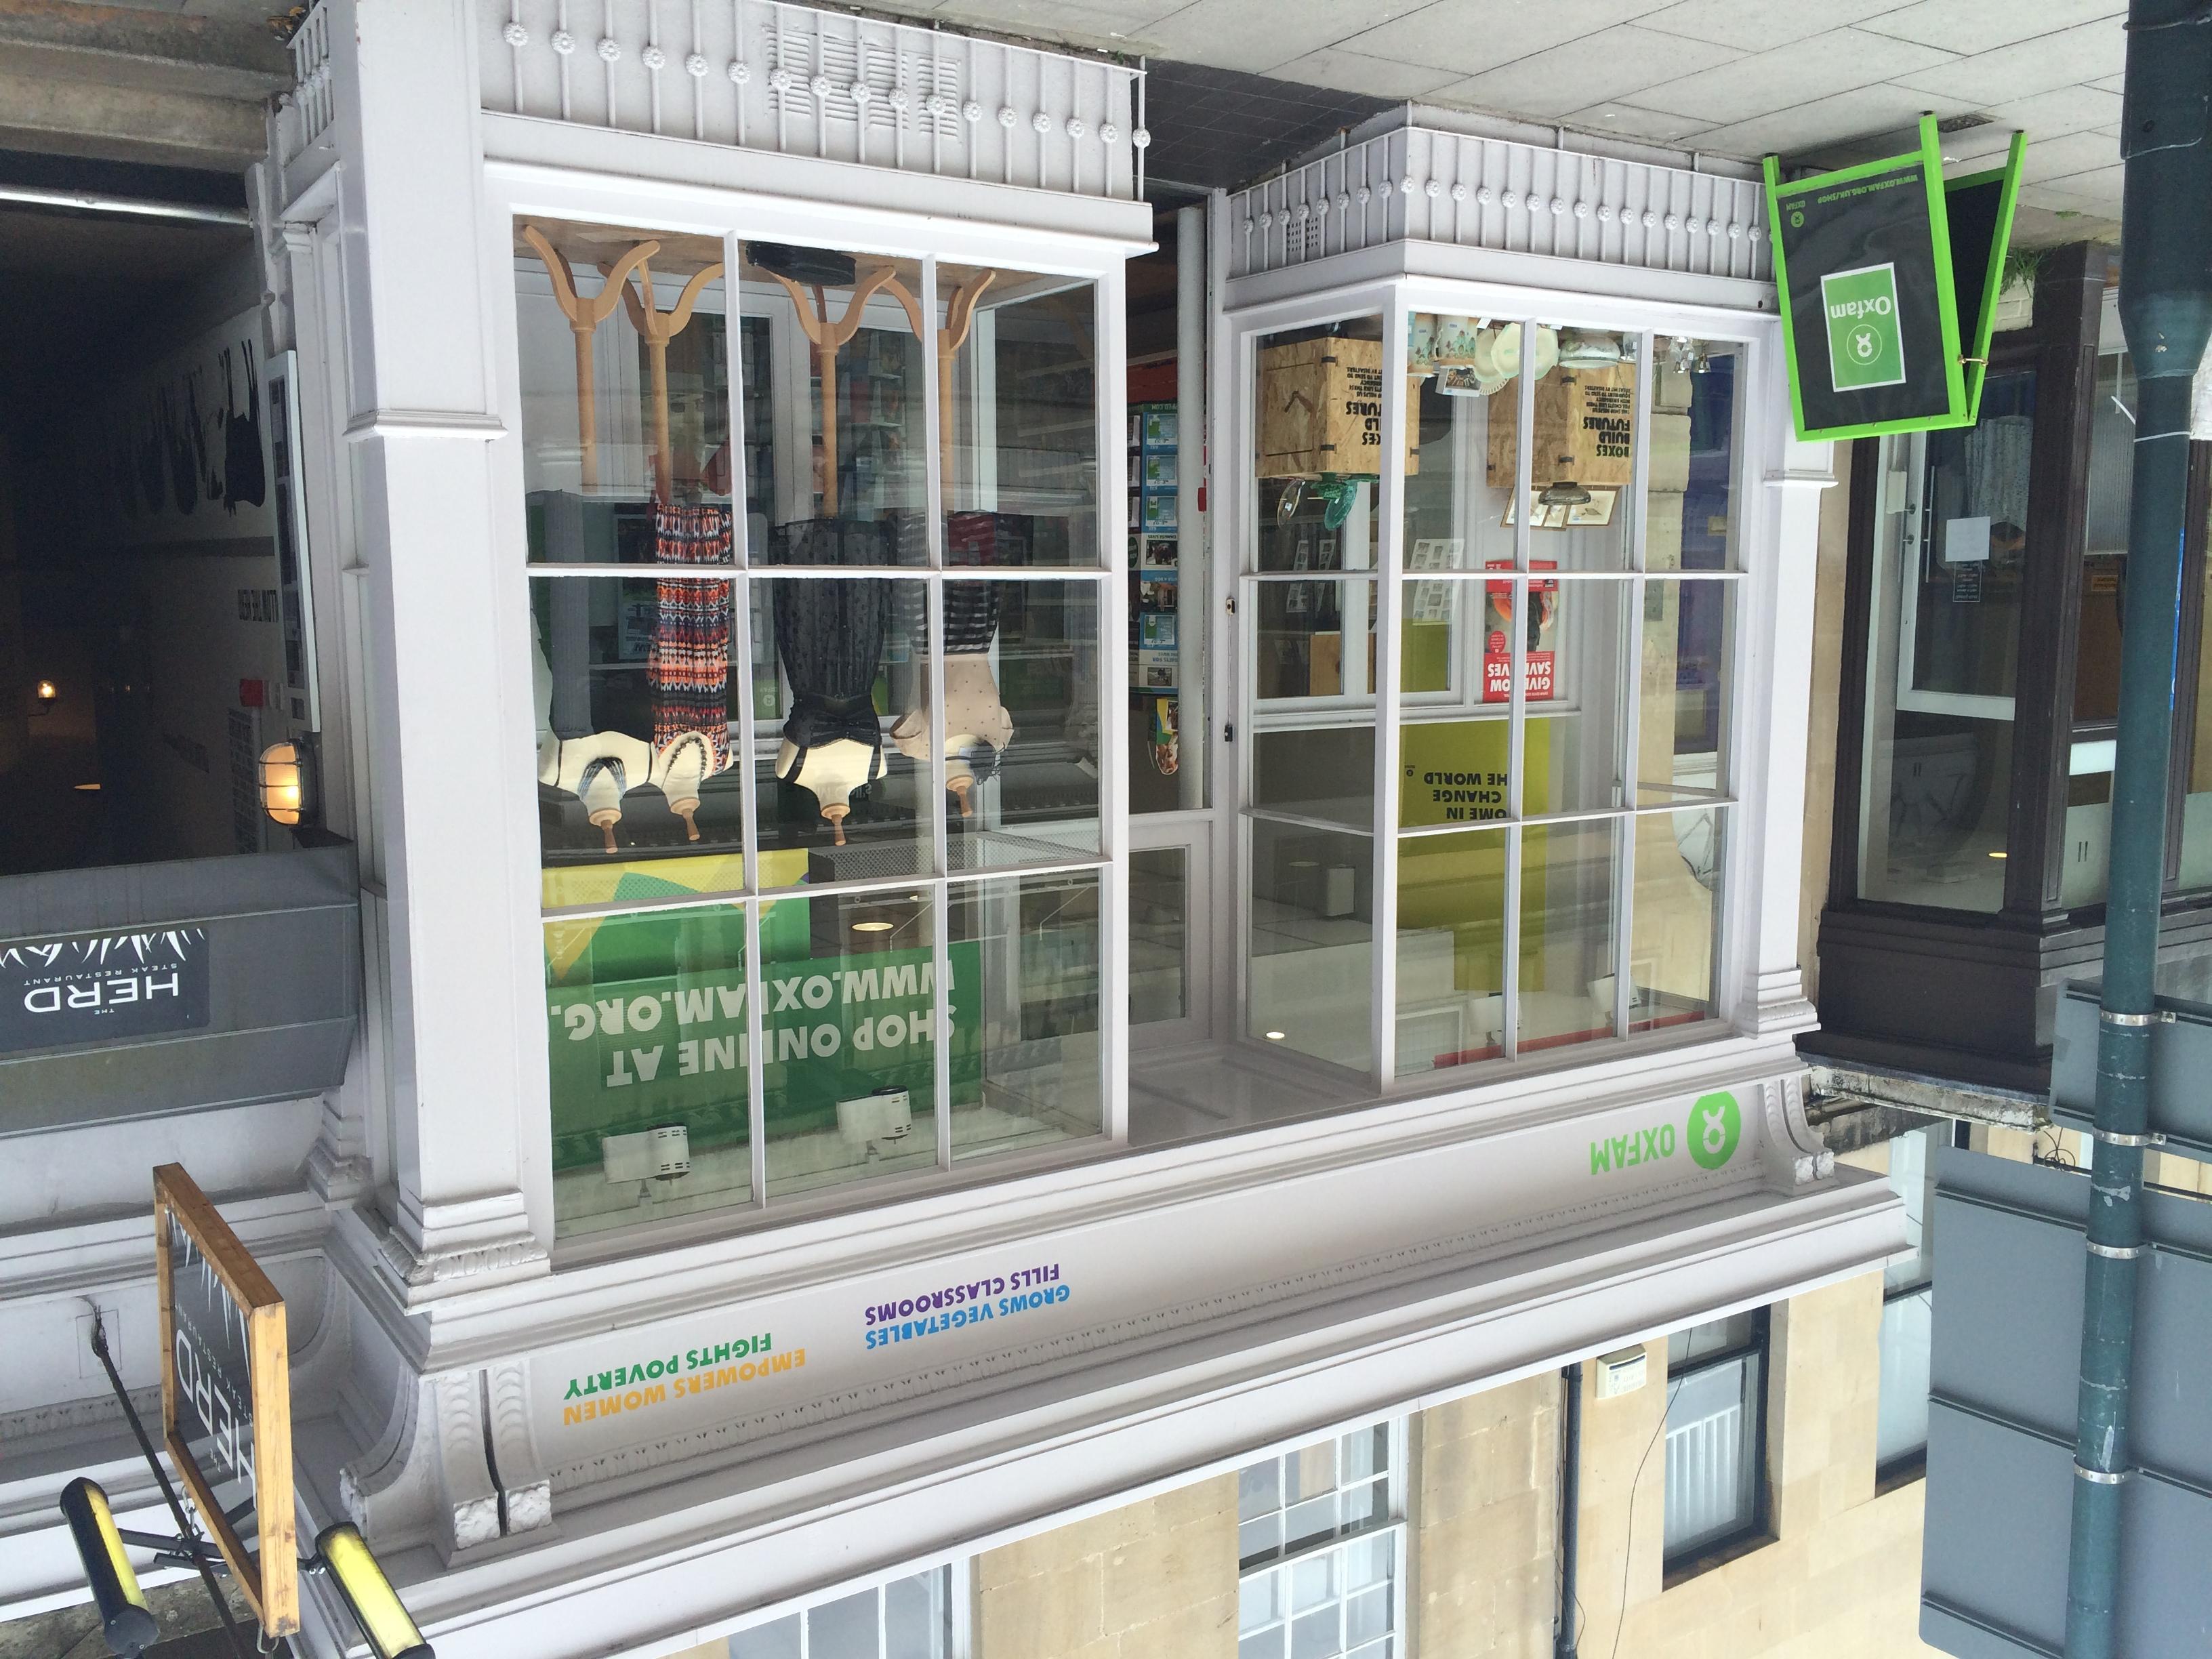 f51354a1800 File:Shopfront to 12 Argyle Street, Bath - June 2014.jpg - Wikimedia ...